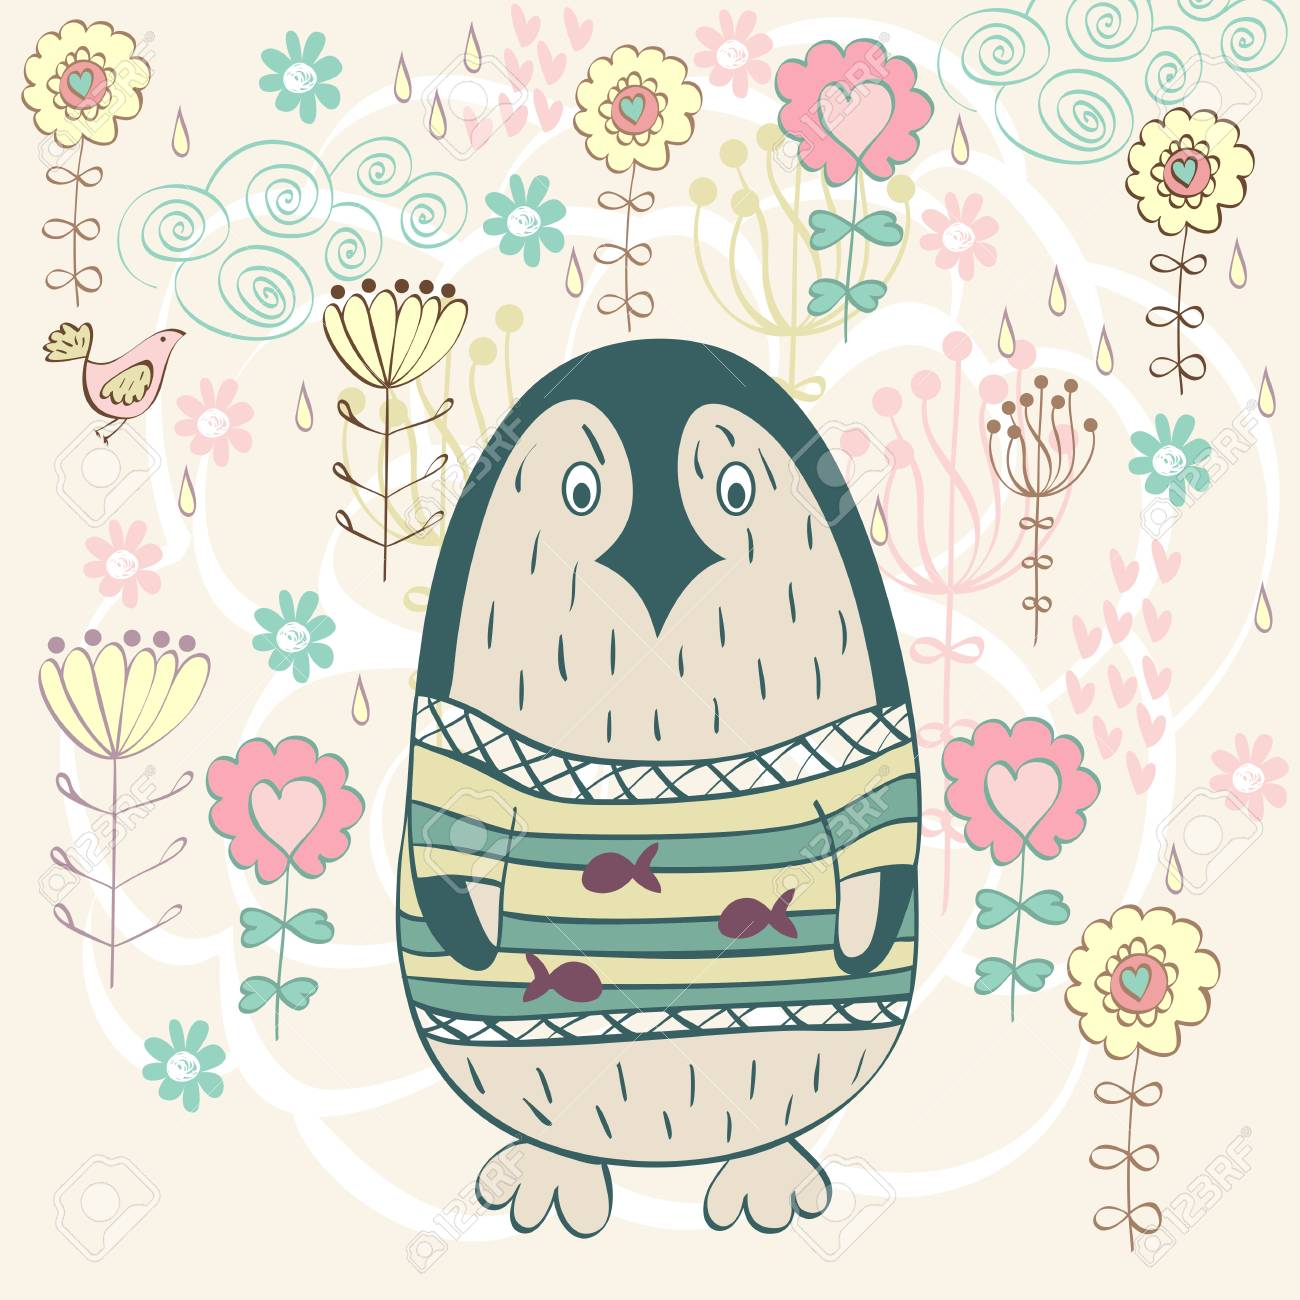 Cute Cartoon Penguin In Spring Flowers Vector Illustration Royalty